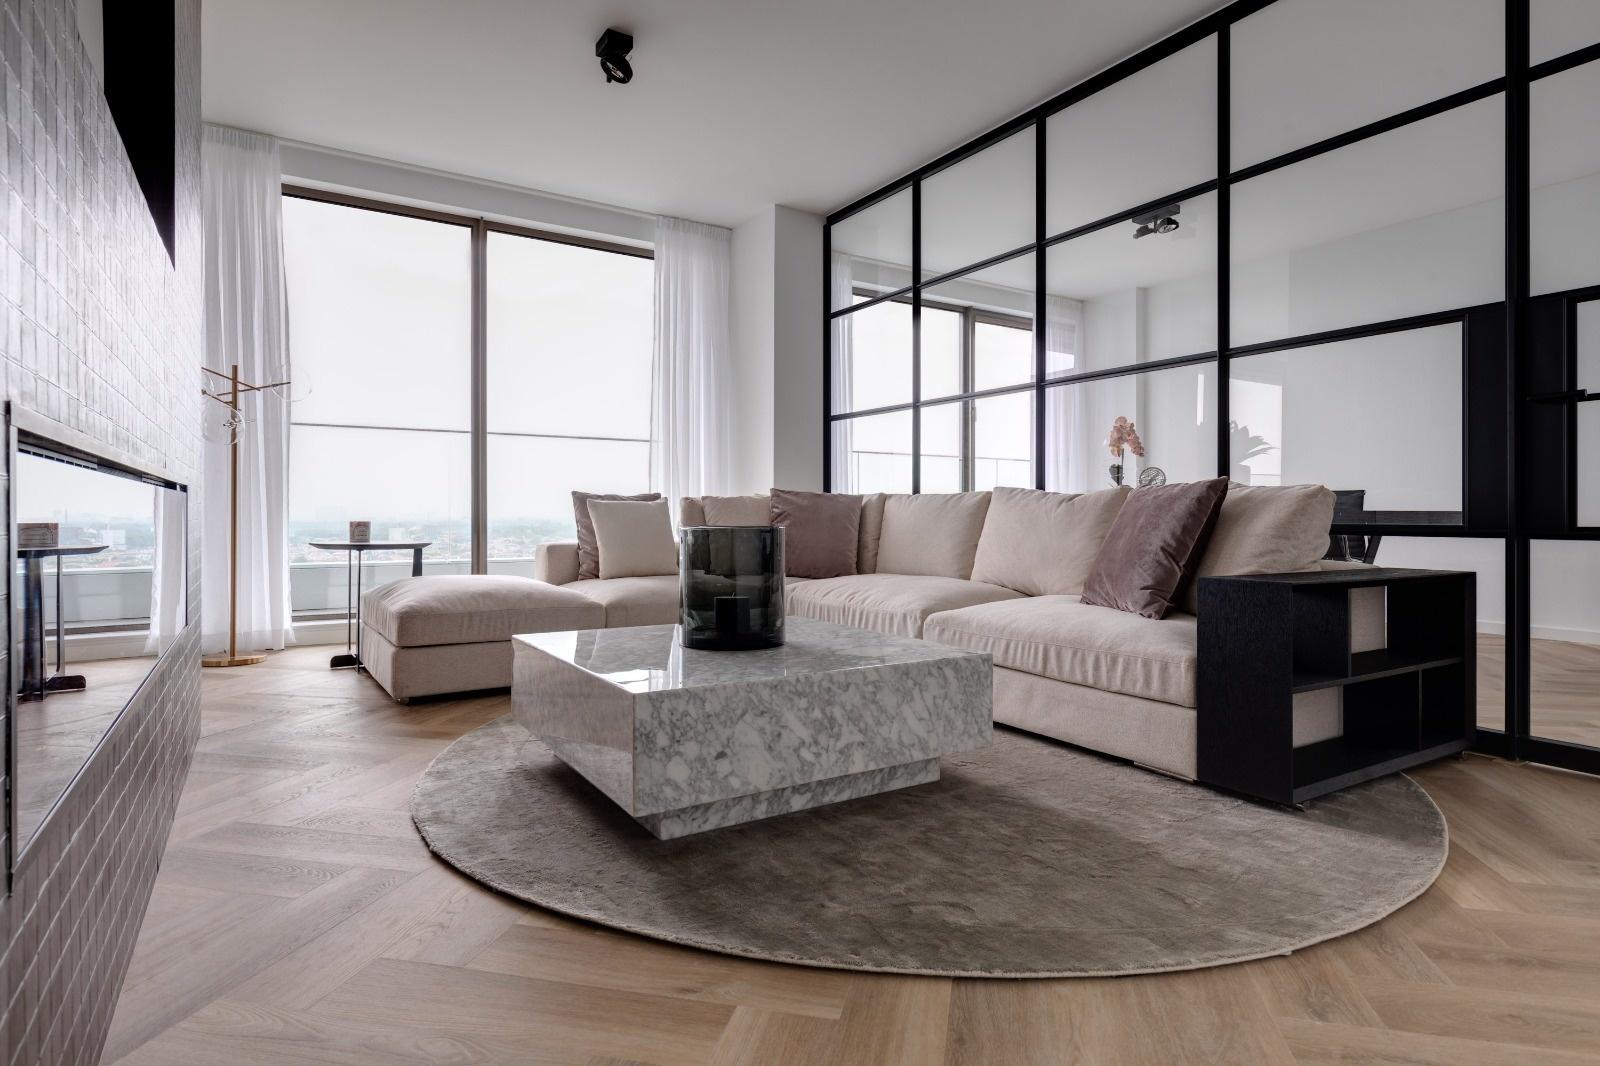 CHIANTI ROUND Carpet Spray Green 280cm-2